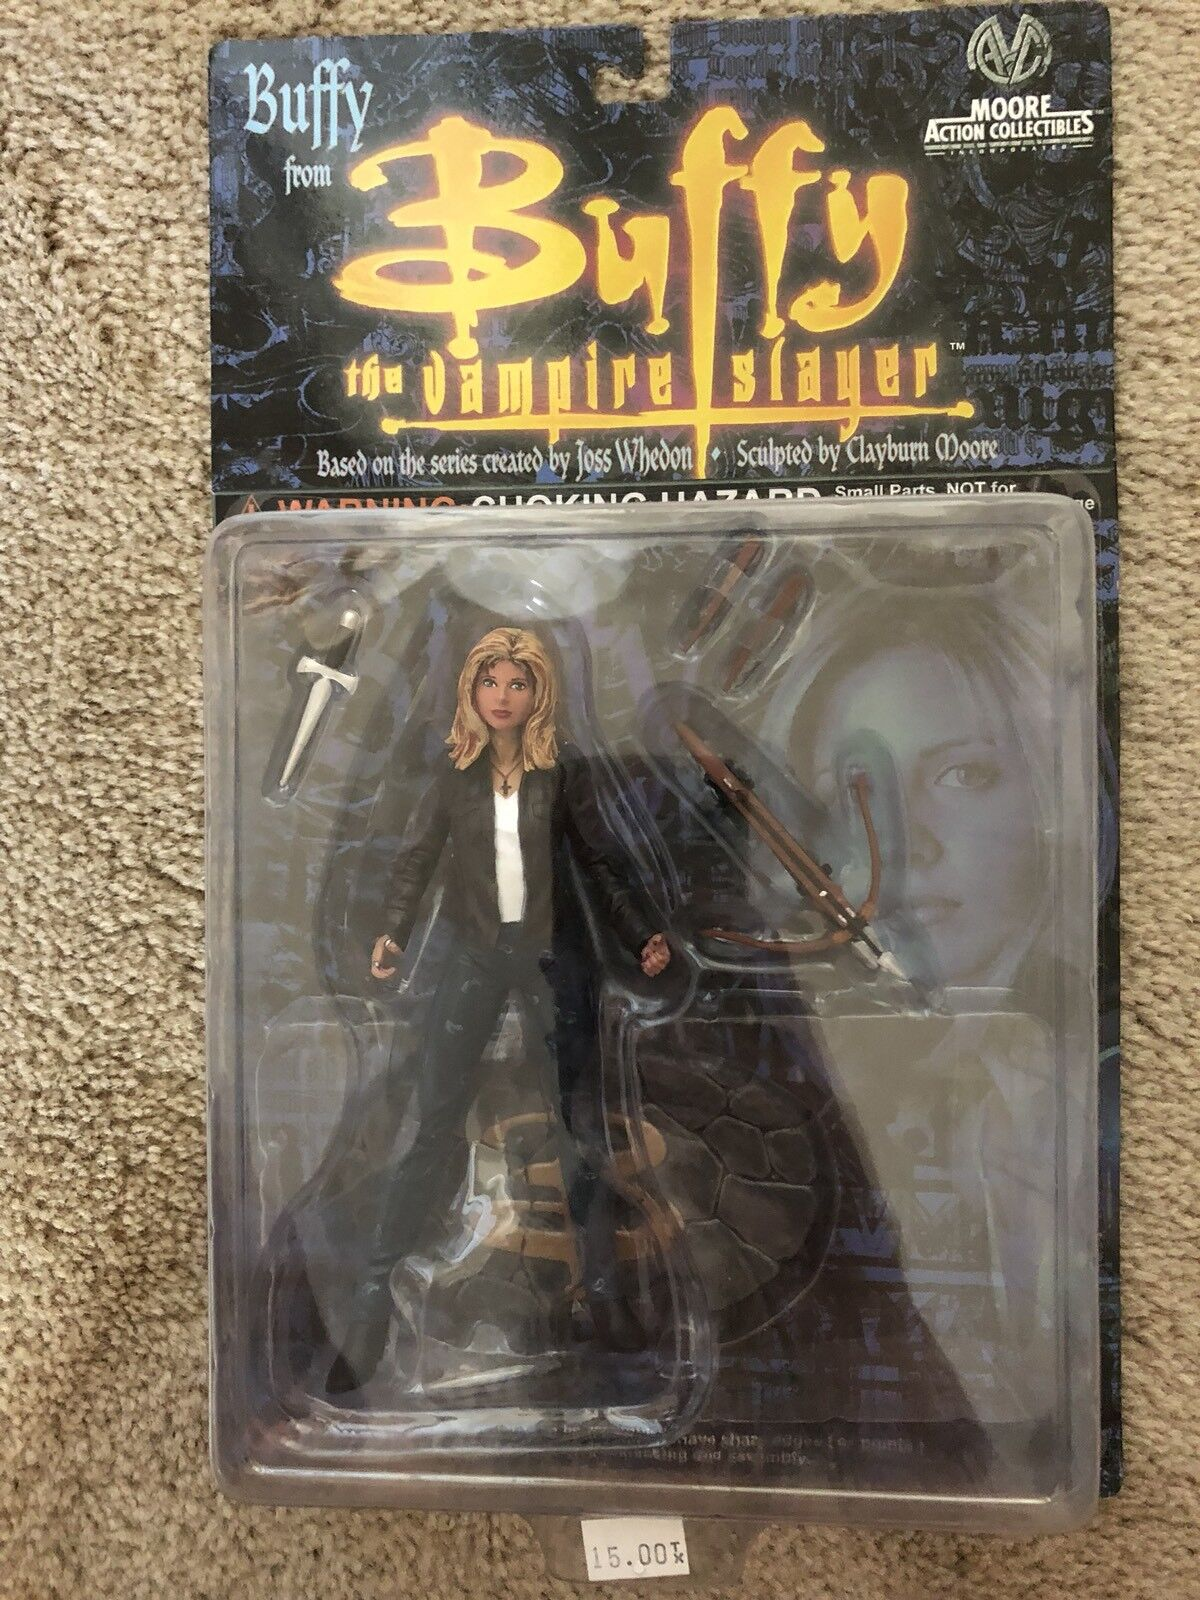 Buffy the Vampire Slayer Buffy season 1 figure Moore Action Collectibles